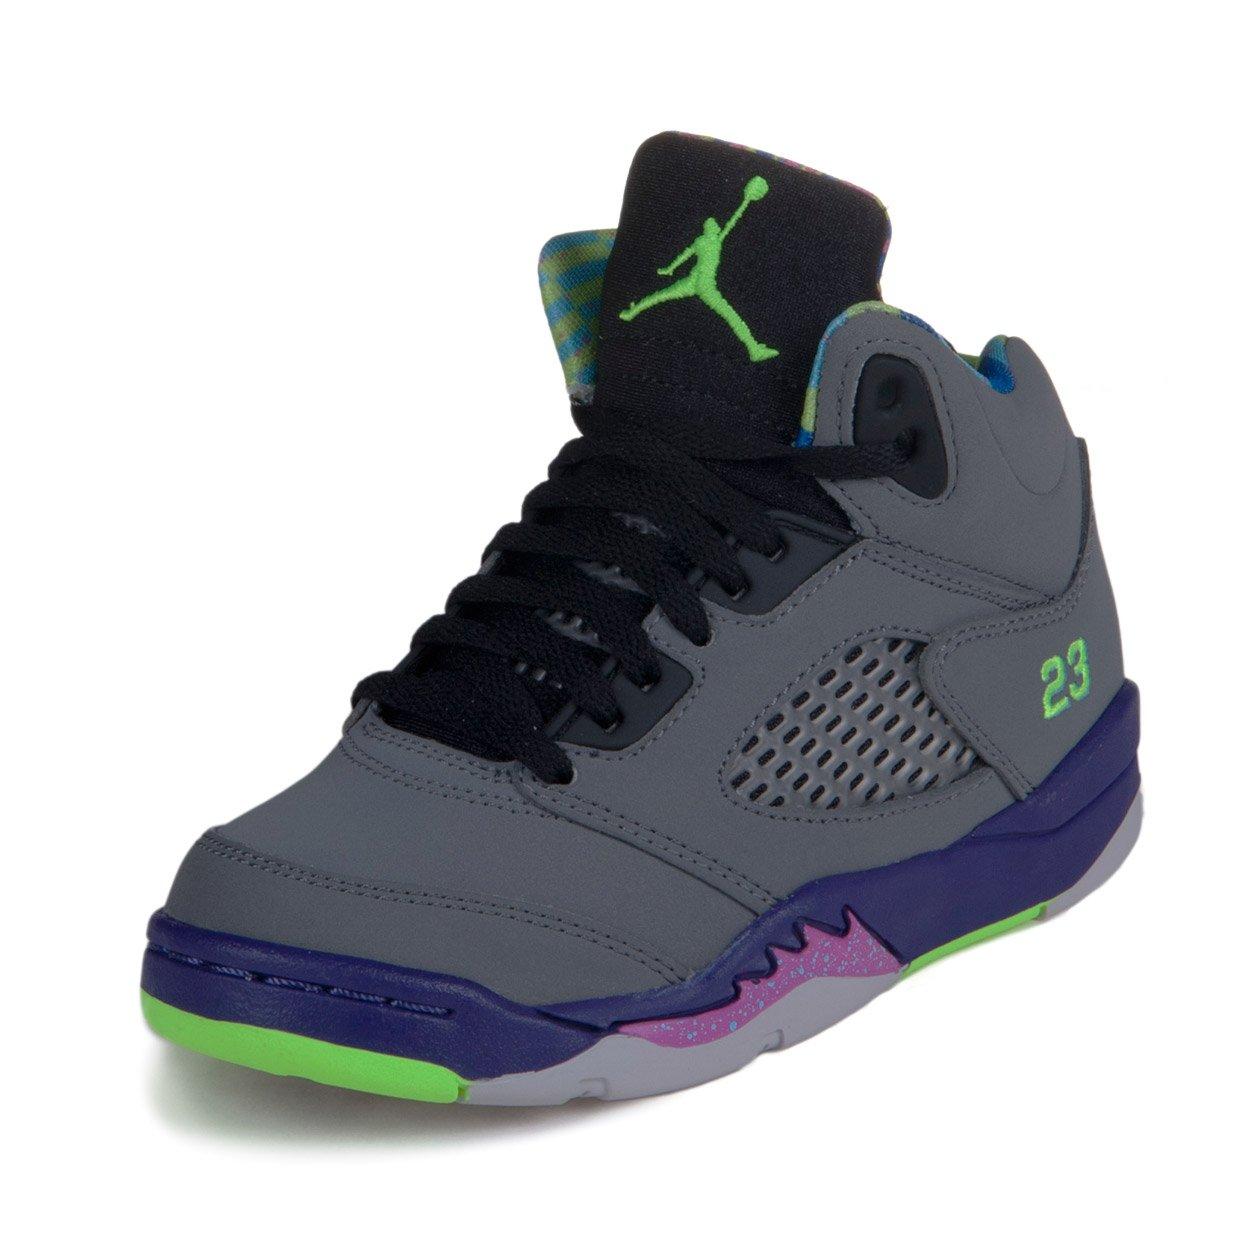 Jordan 5 Retro (PS) - 1.5Y ''Bel Air'' - 440889 090